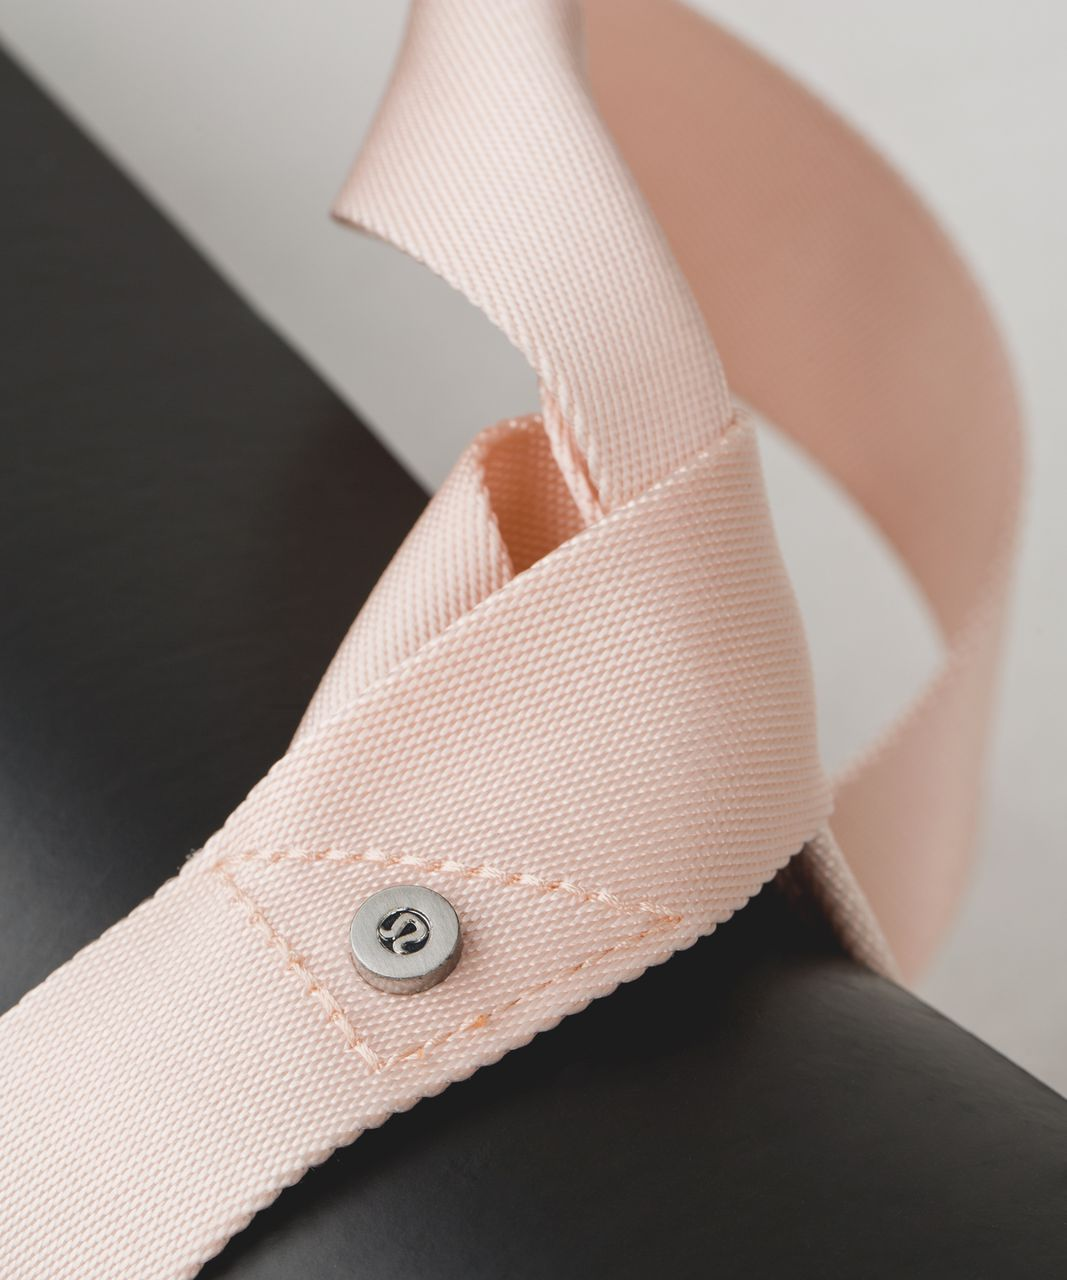 Lululemon Loop It Up Mat Strap - Butter Pink